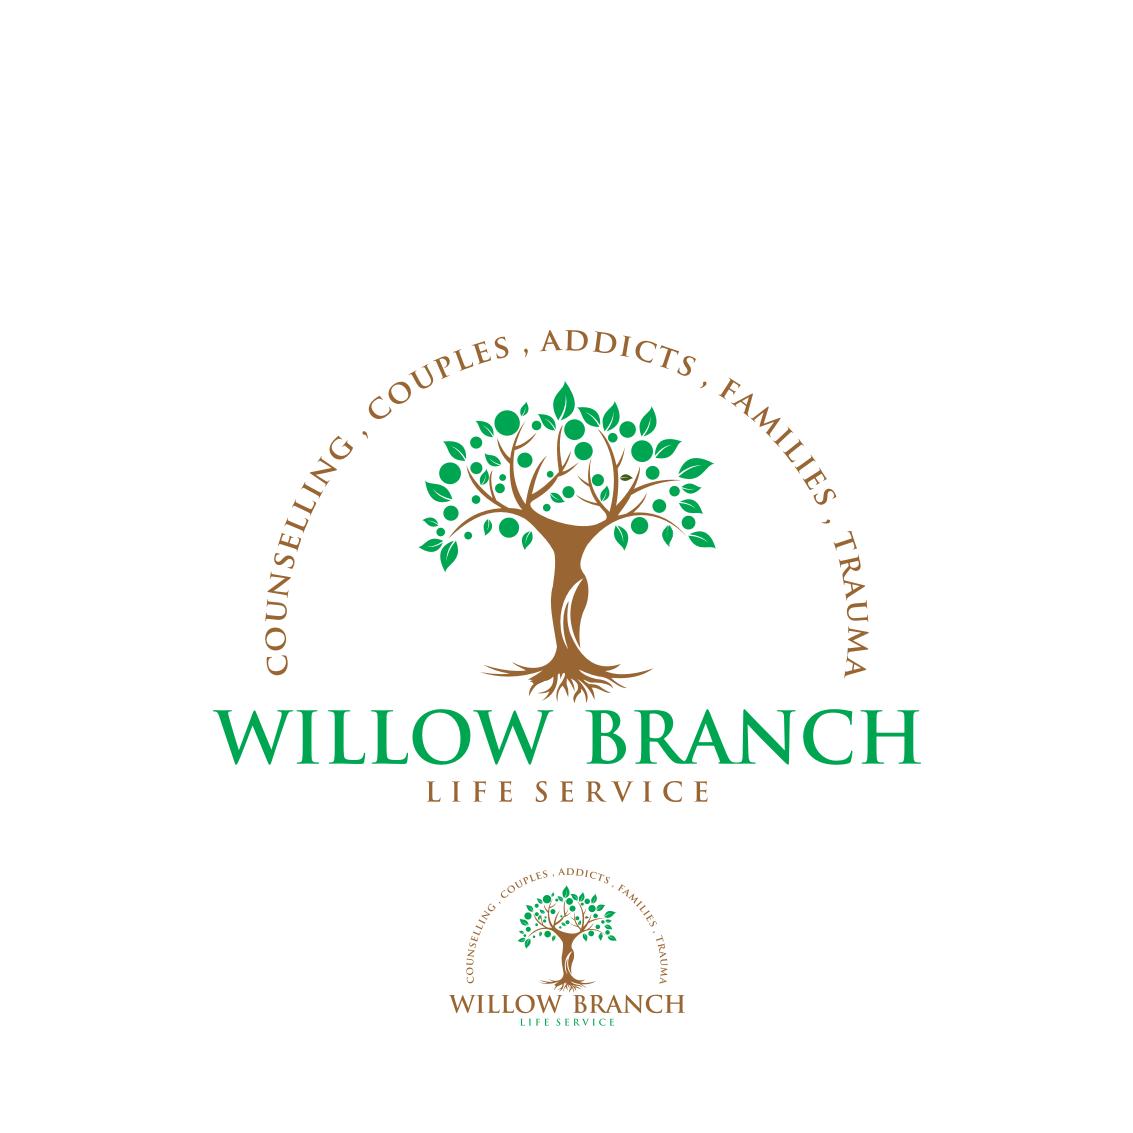 Logo Design by Analla Art - Entry No. 91 in the Logo Design Contest Artistic Logo Design for Willow Branch Life Service.